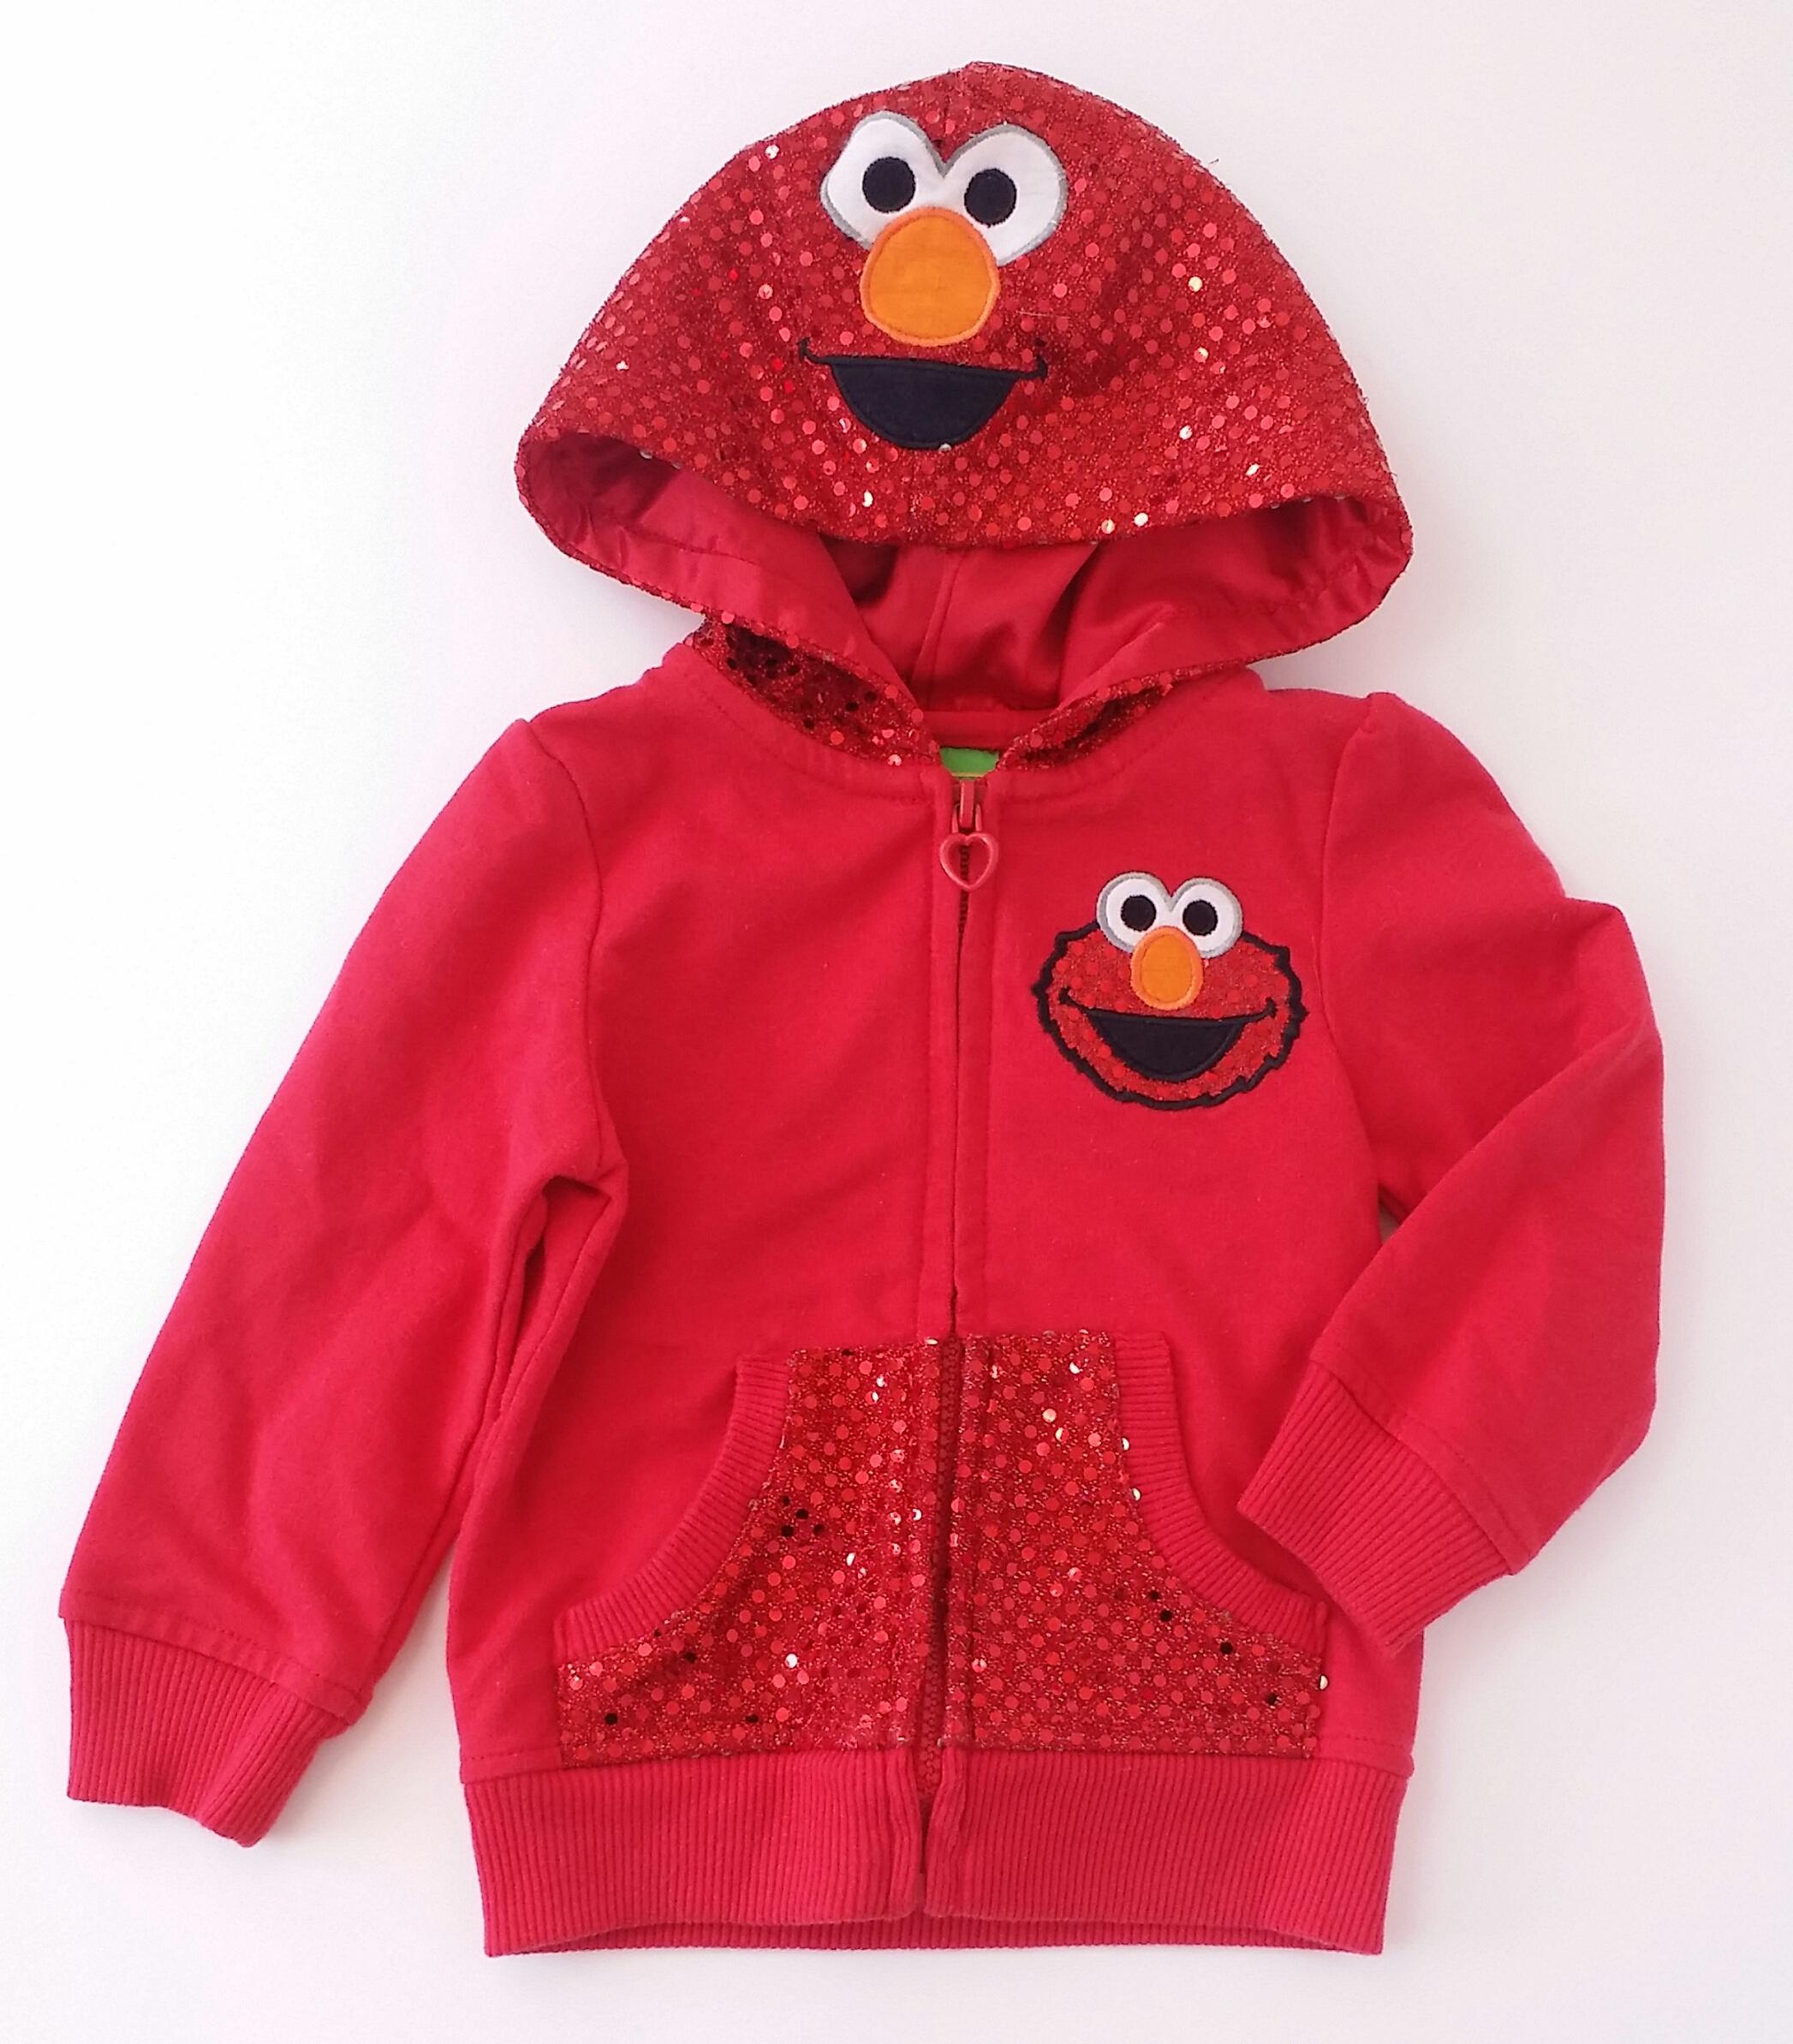 Sesame-Street-3-YEARS-Sequin-Jacket_2110854A.jpg